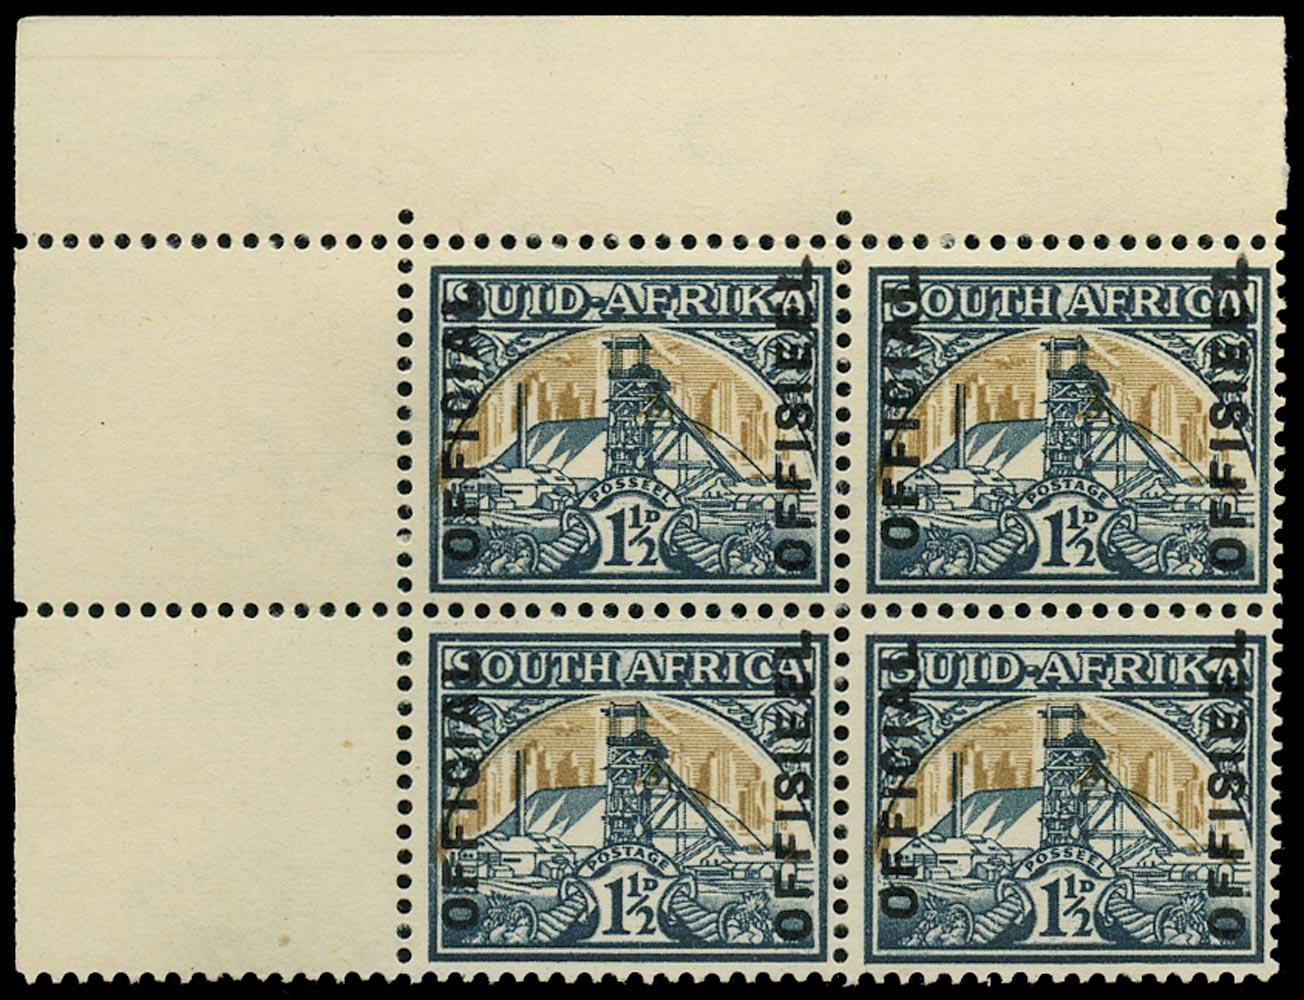 SOUTH AFRICA 1949  SGO34 Official